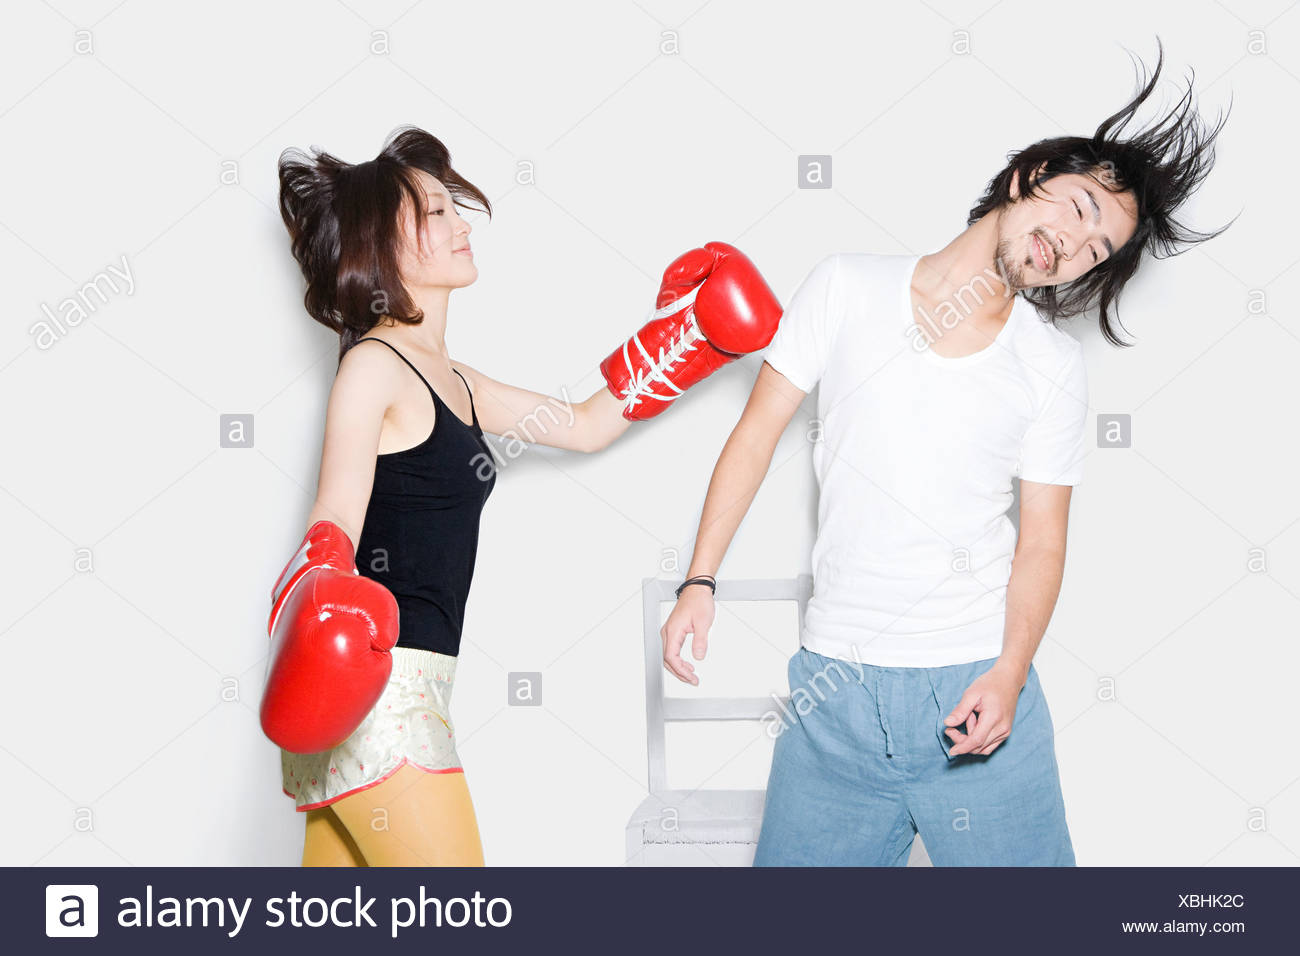 Couple boxing - Stock Image